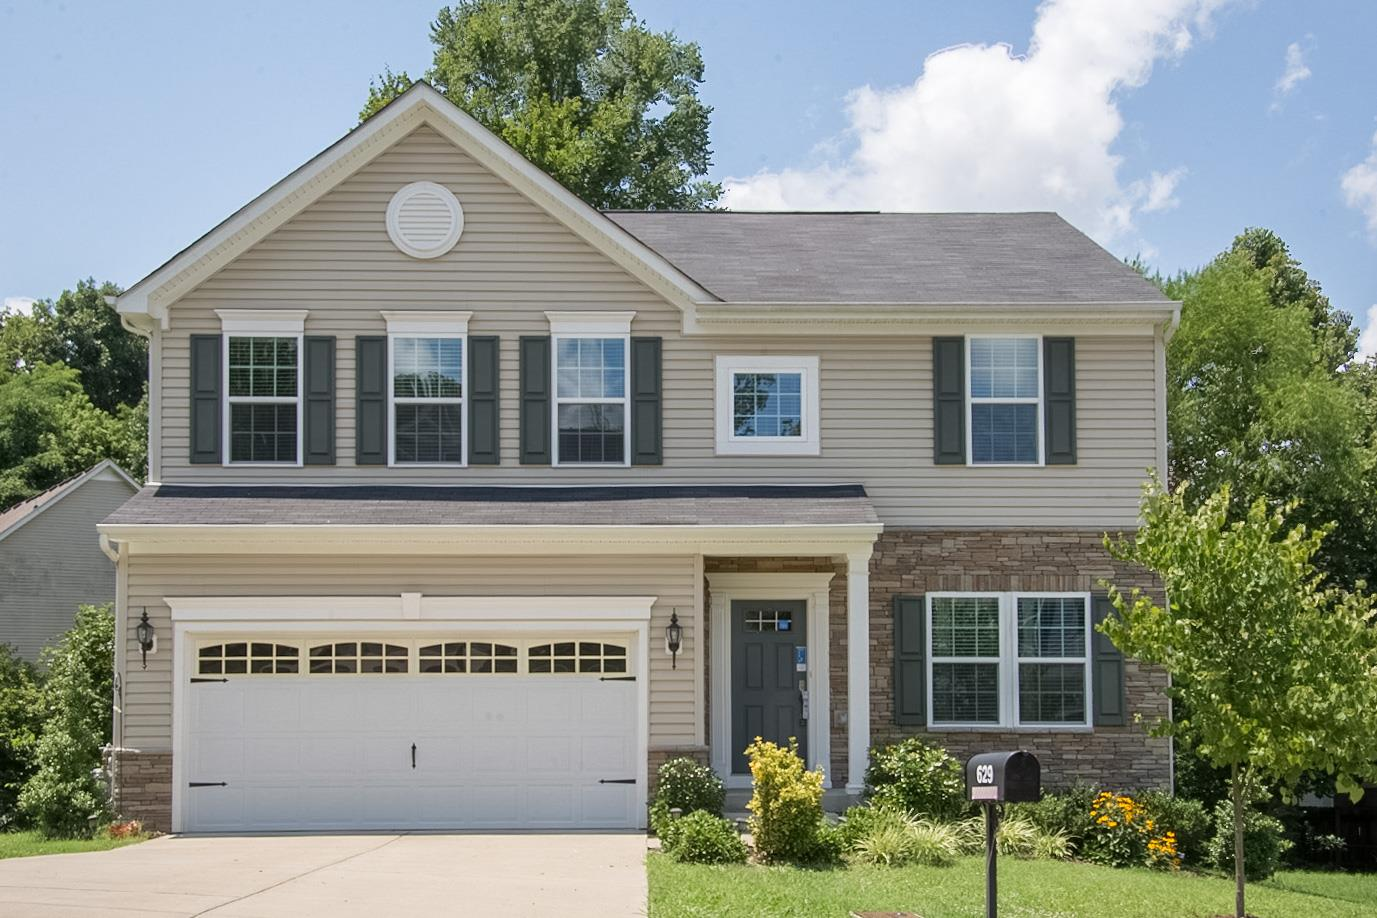 629 Summerbreeze Ln, Antioch, TN 37013 - Antioch, TN real estate listing